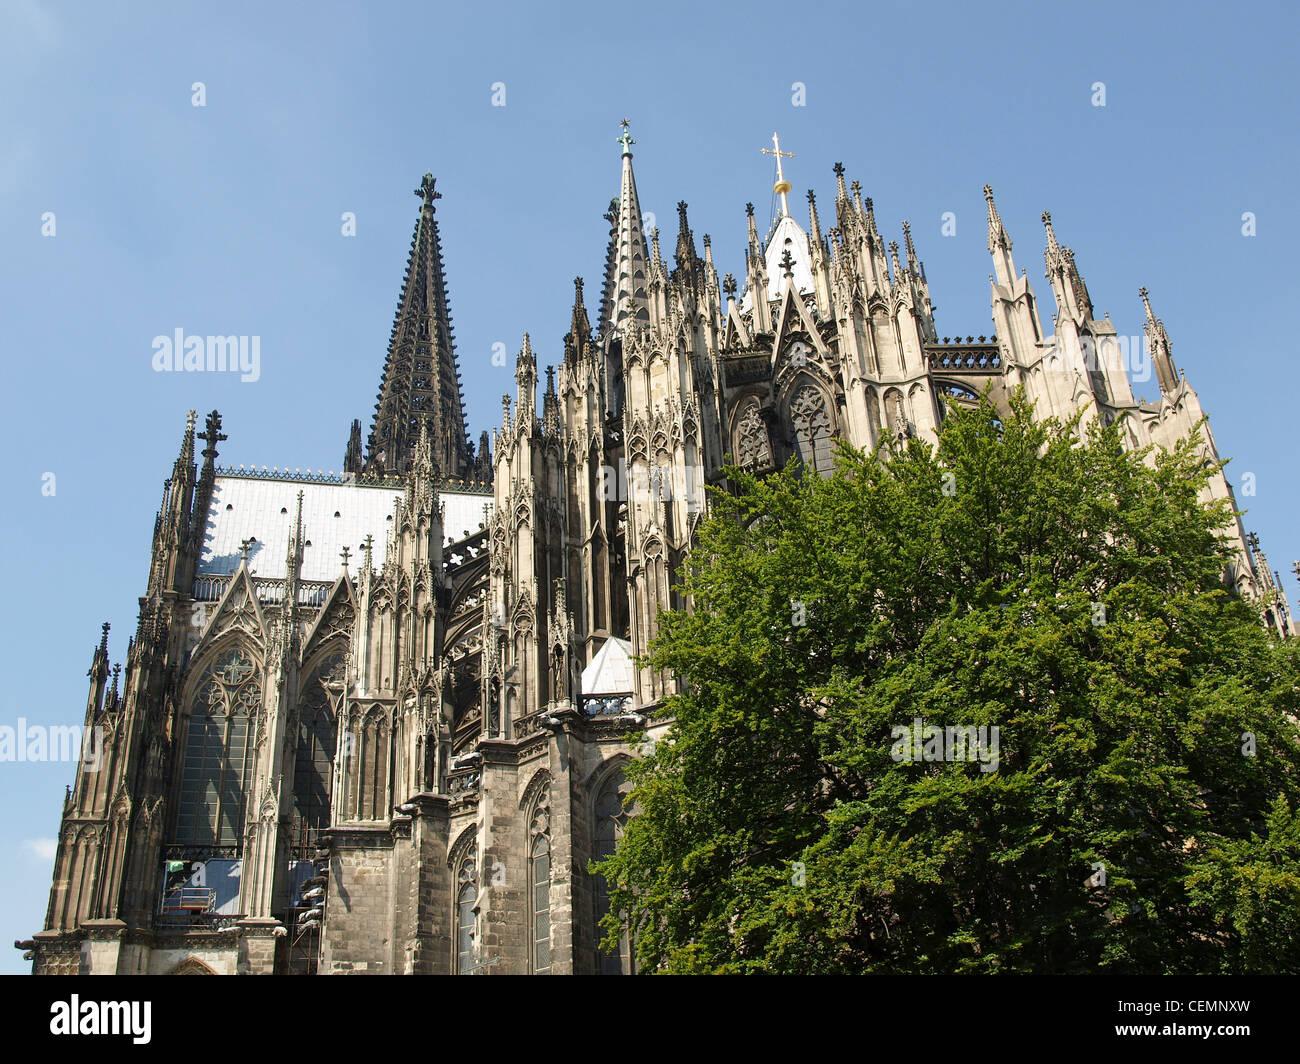 Koelner Dom (Cologne Cathedral) in Koeln, Germany Stock Photo